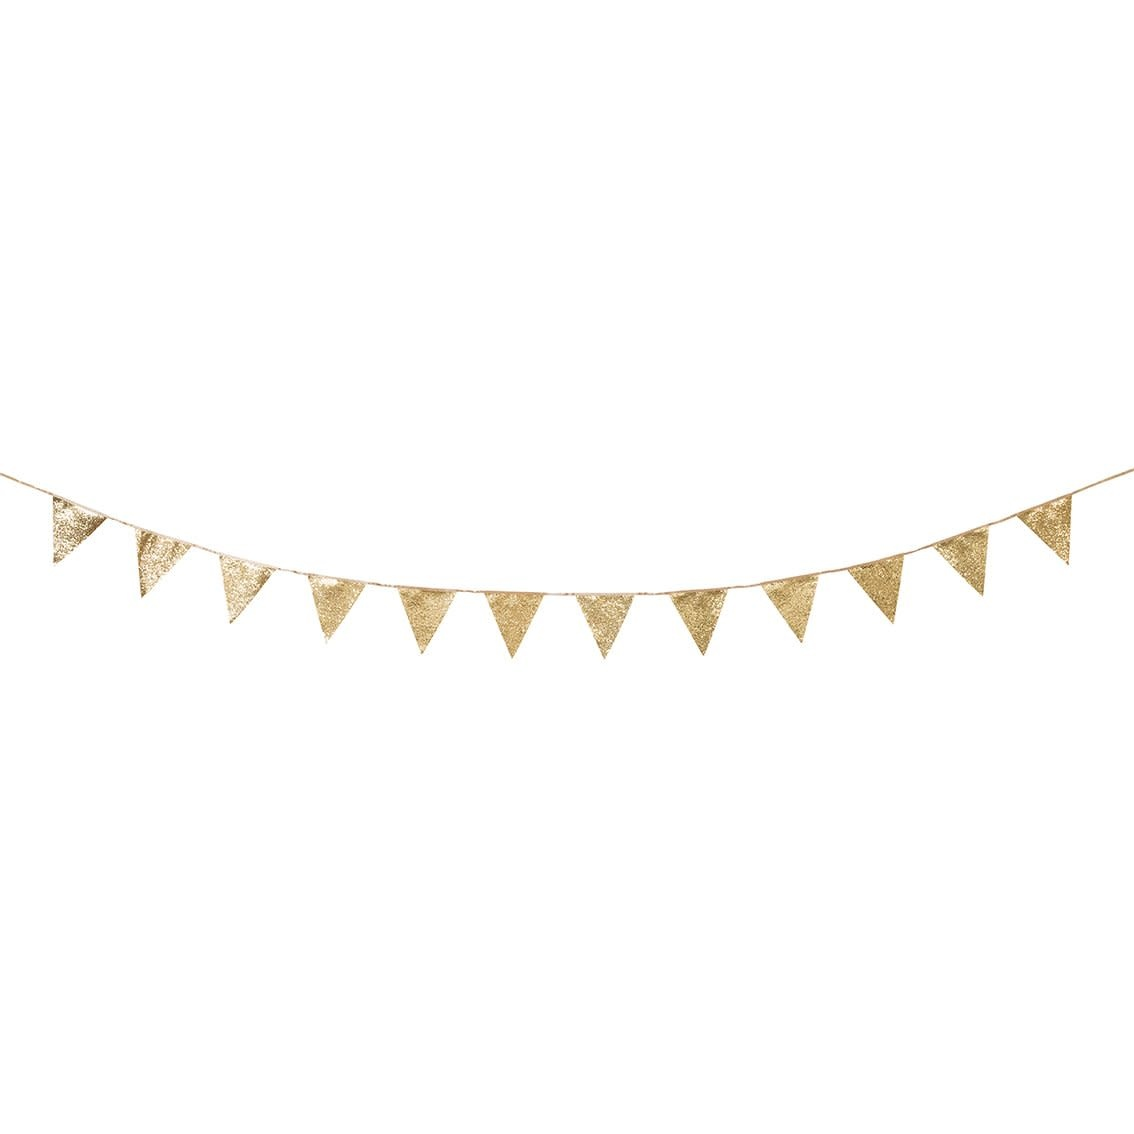 TT Luxe Gold Glitter Bunting